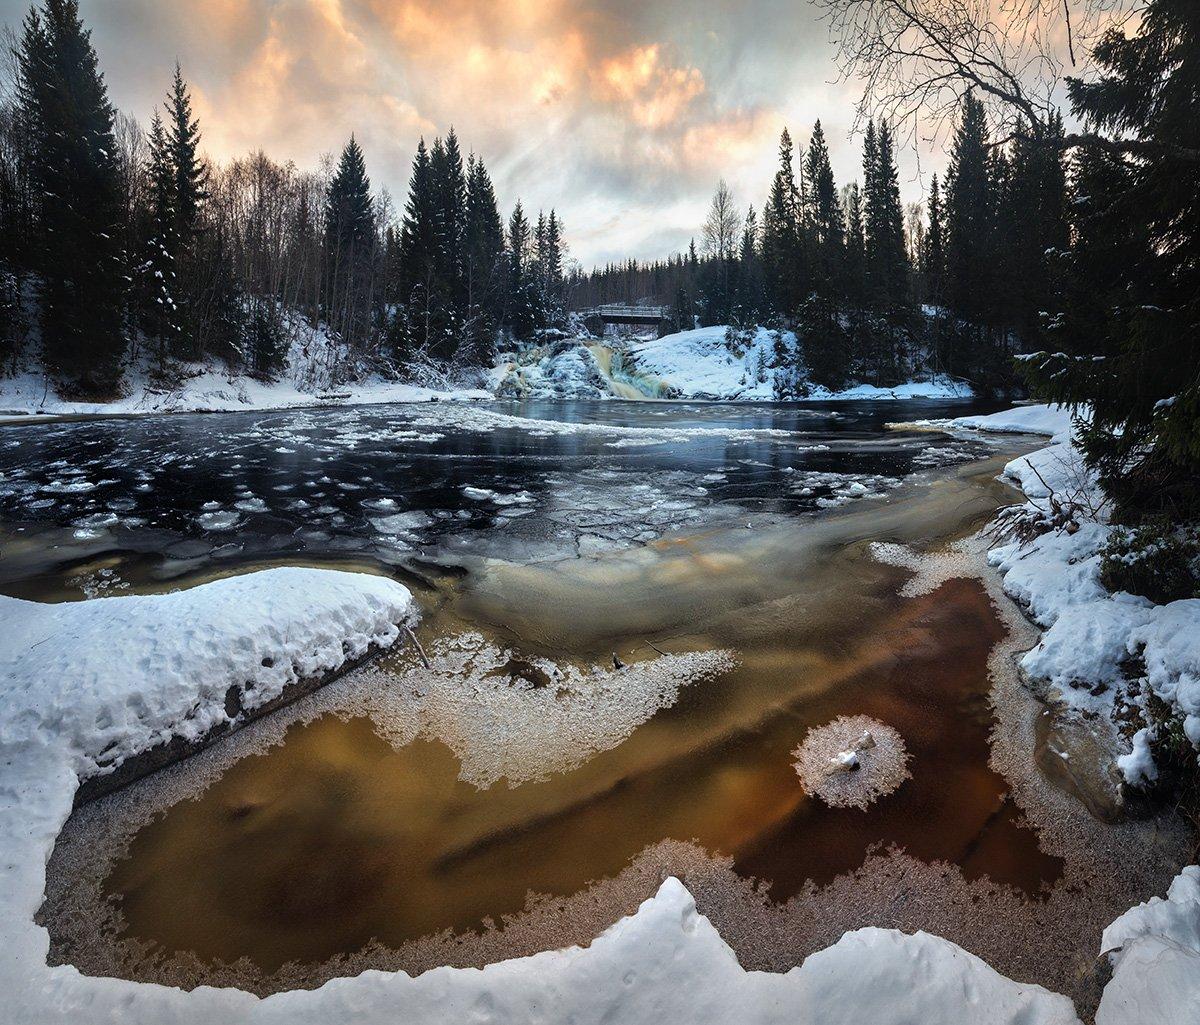 winter,forest,river,norway,norwegian,homla,frost,freezing,frozen,ice,snow,water,nature,natural,landscape,scandinavia, Adrian Szatewicz